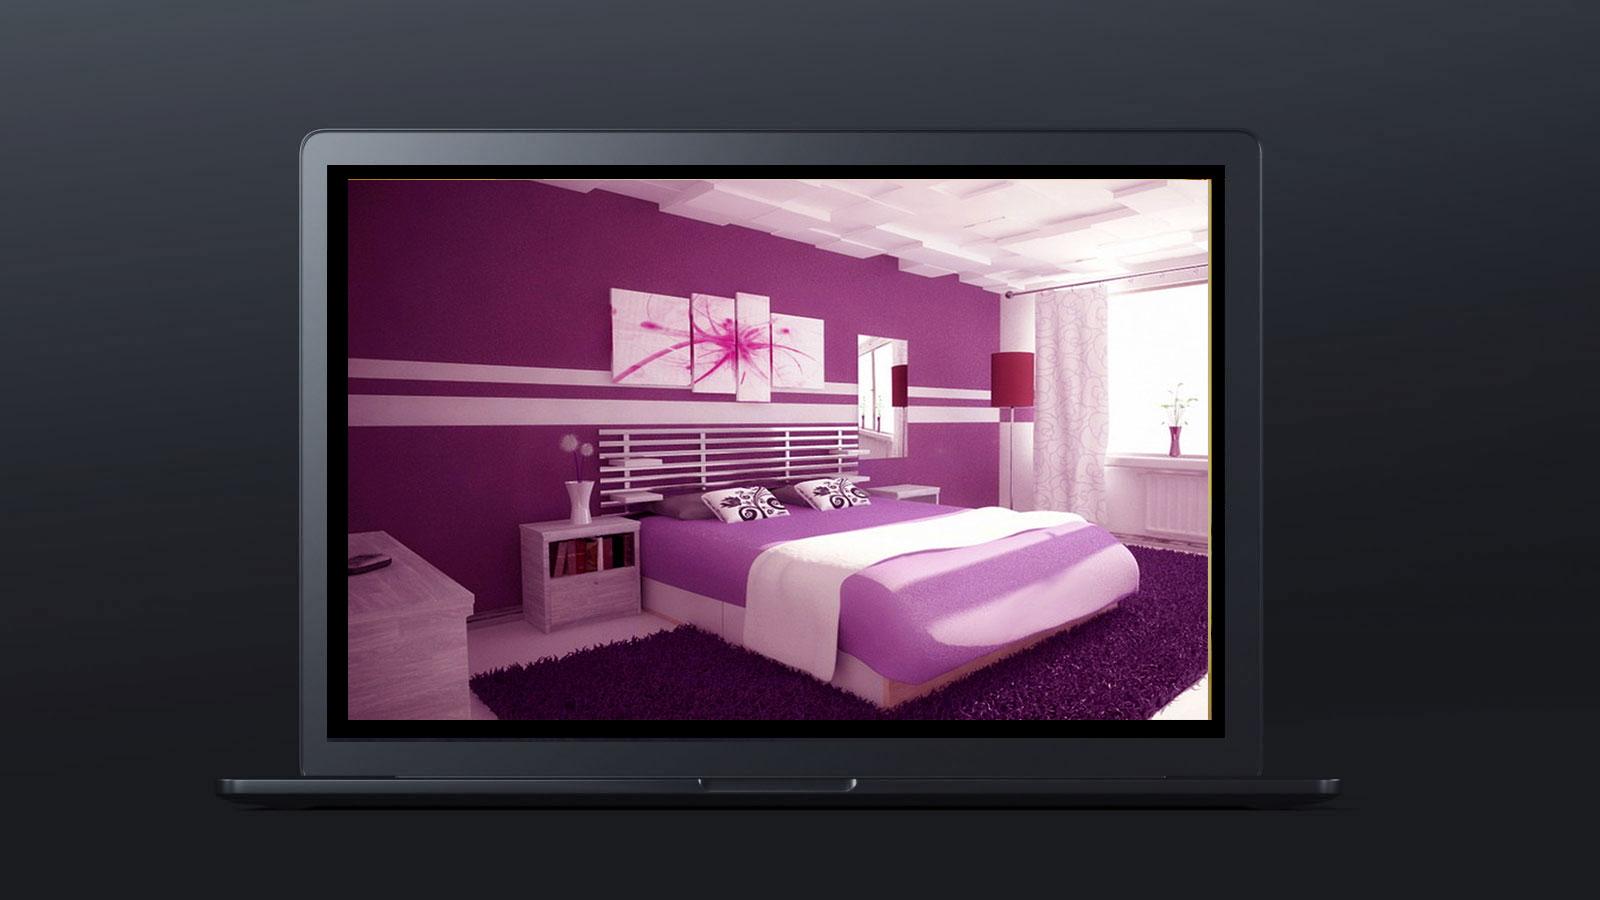 Design Color 8 - نقش رنگ و رنگ آمیزی در دکوراسیون داخلی